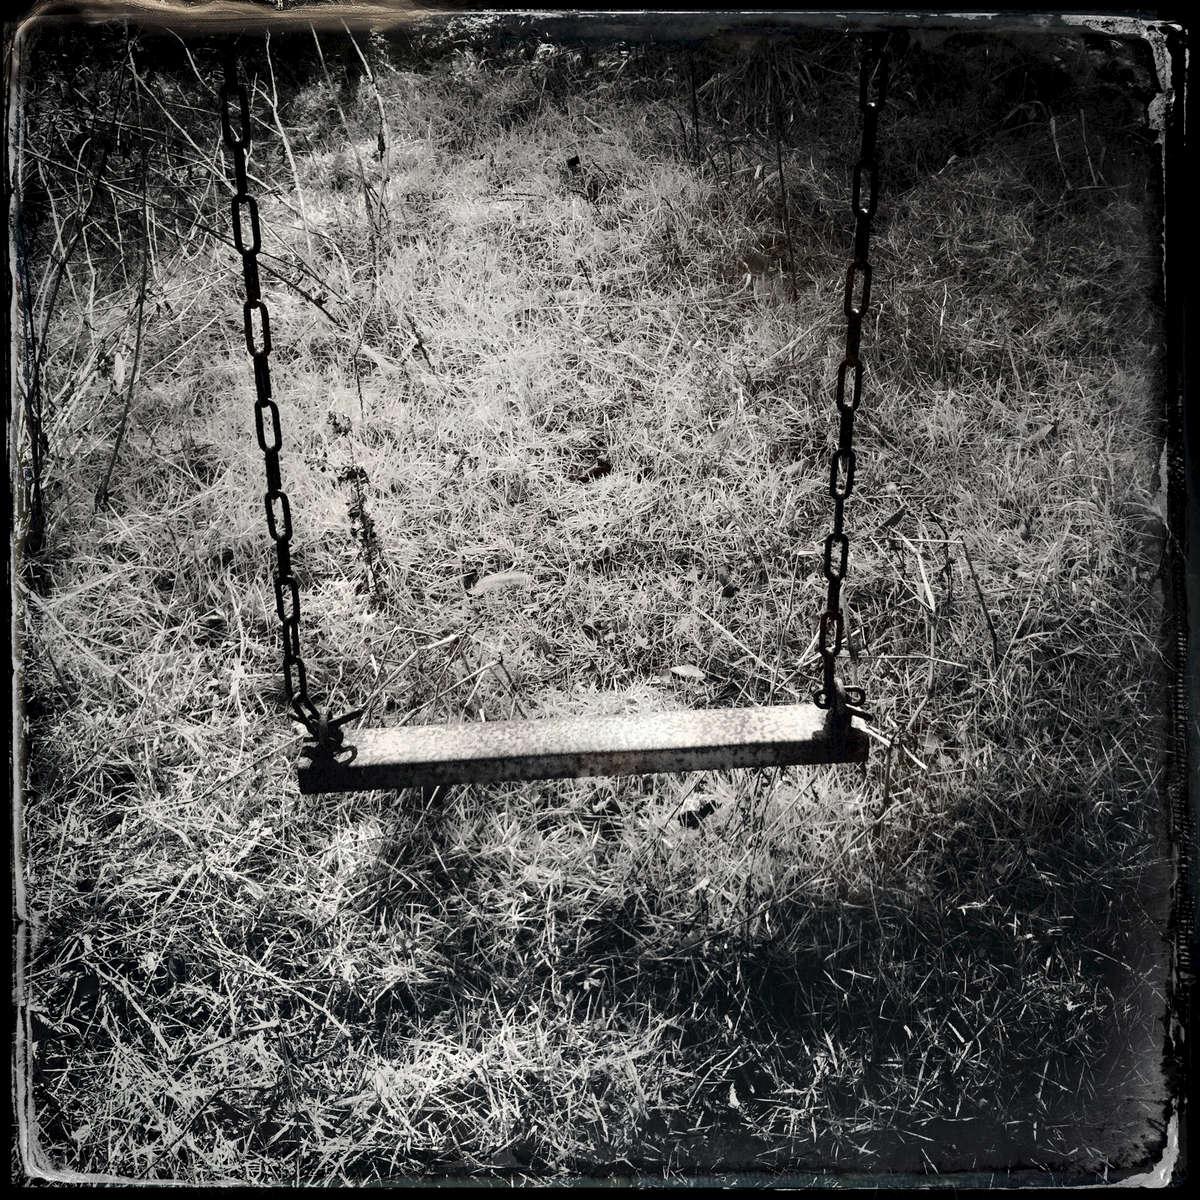 A swing at an abandoned elementary school. Mar/ 2013, Odaka, Minami-Soma.